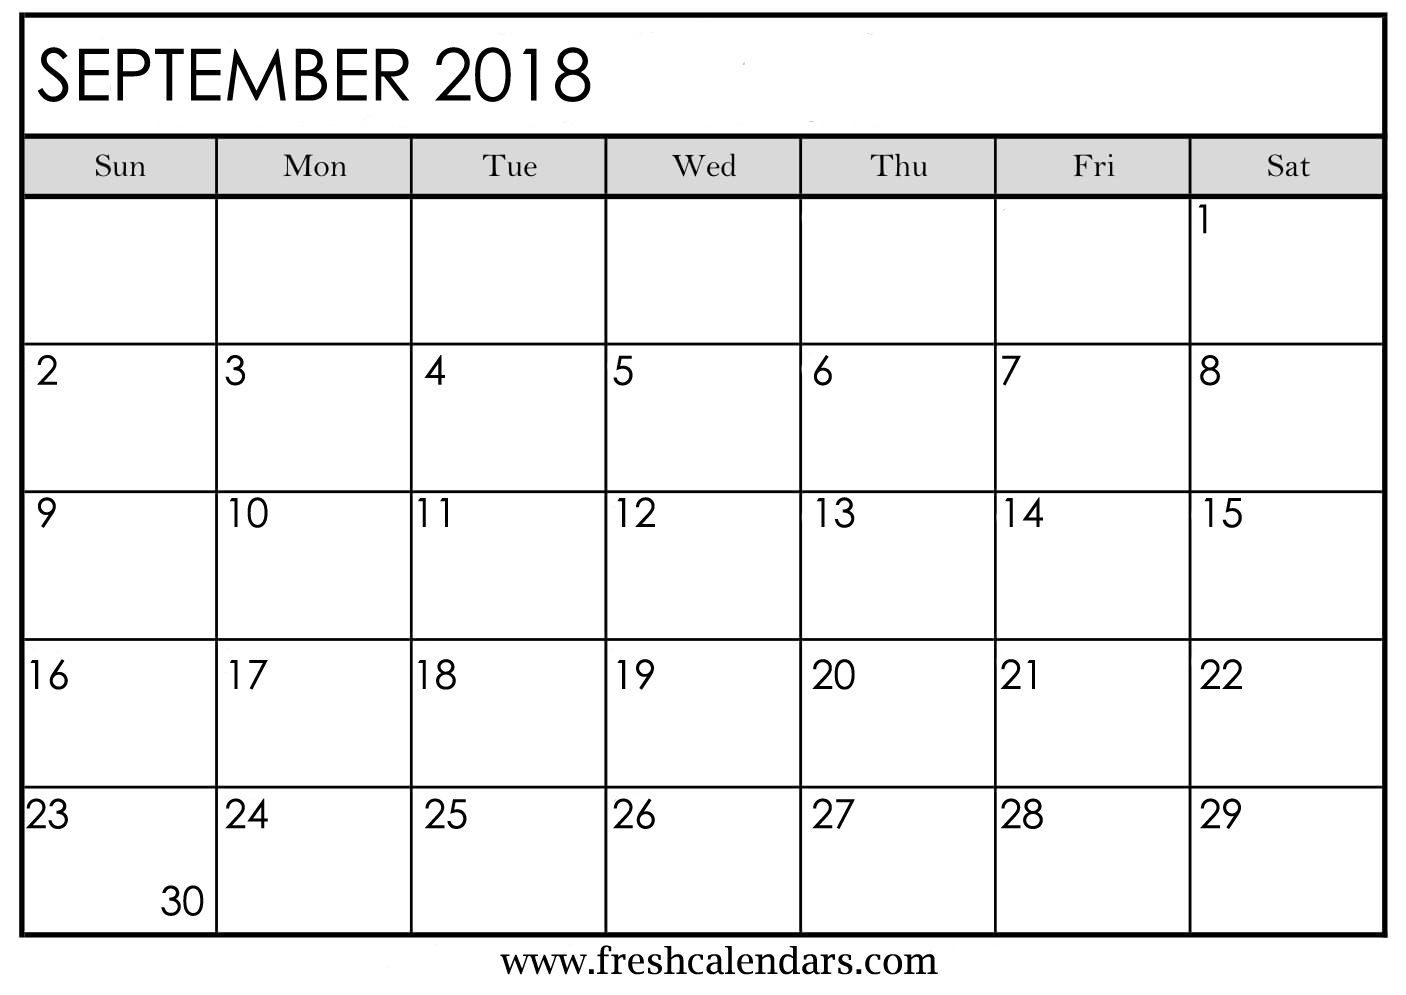 September 2018 Calendar Printable - Fresh Calendars throughout Monday Sunday Calendar Template September